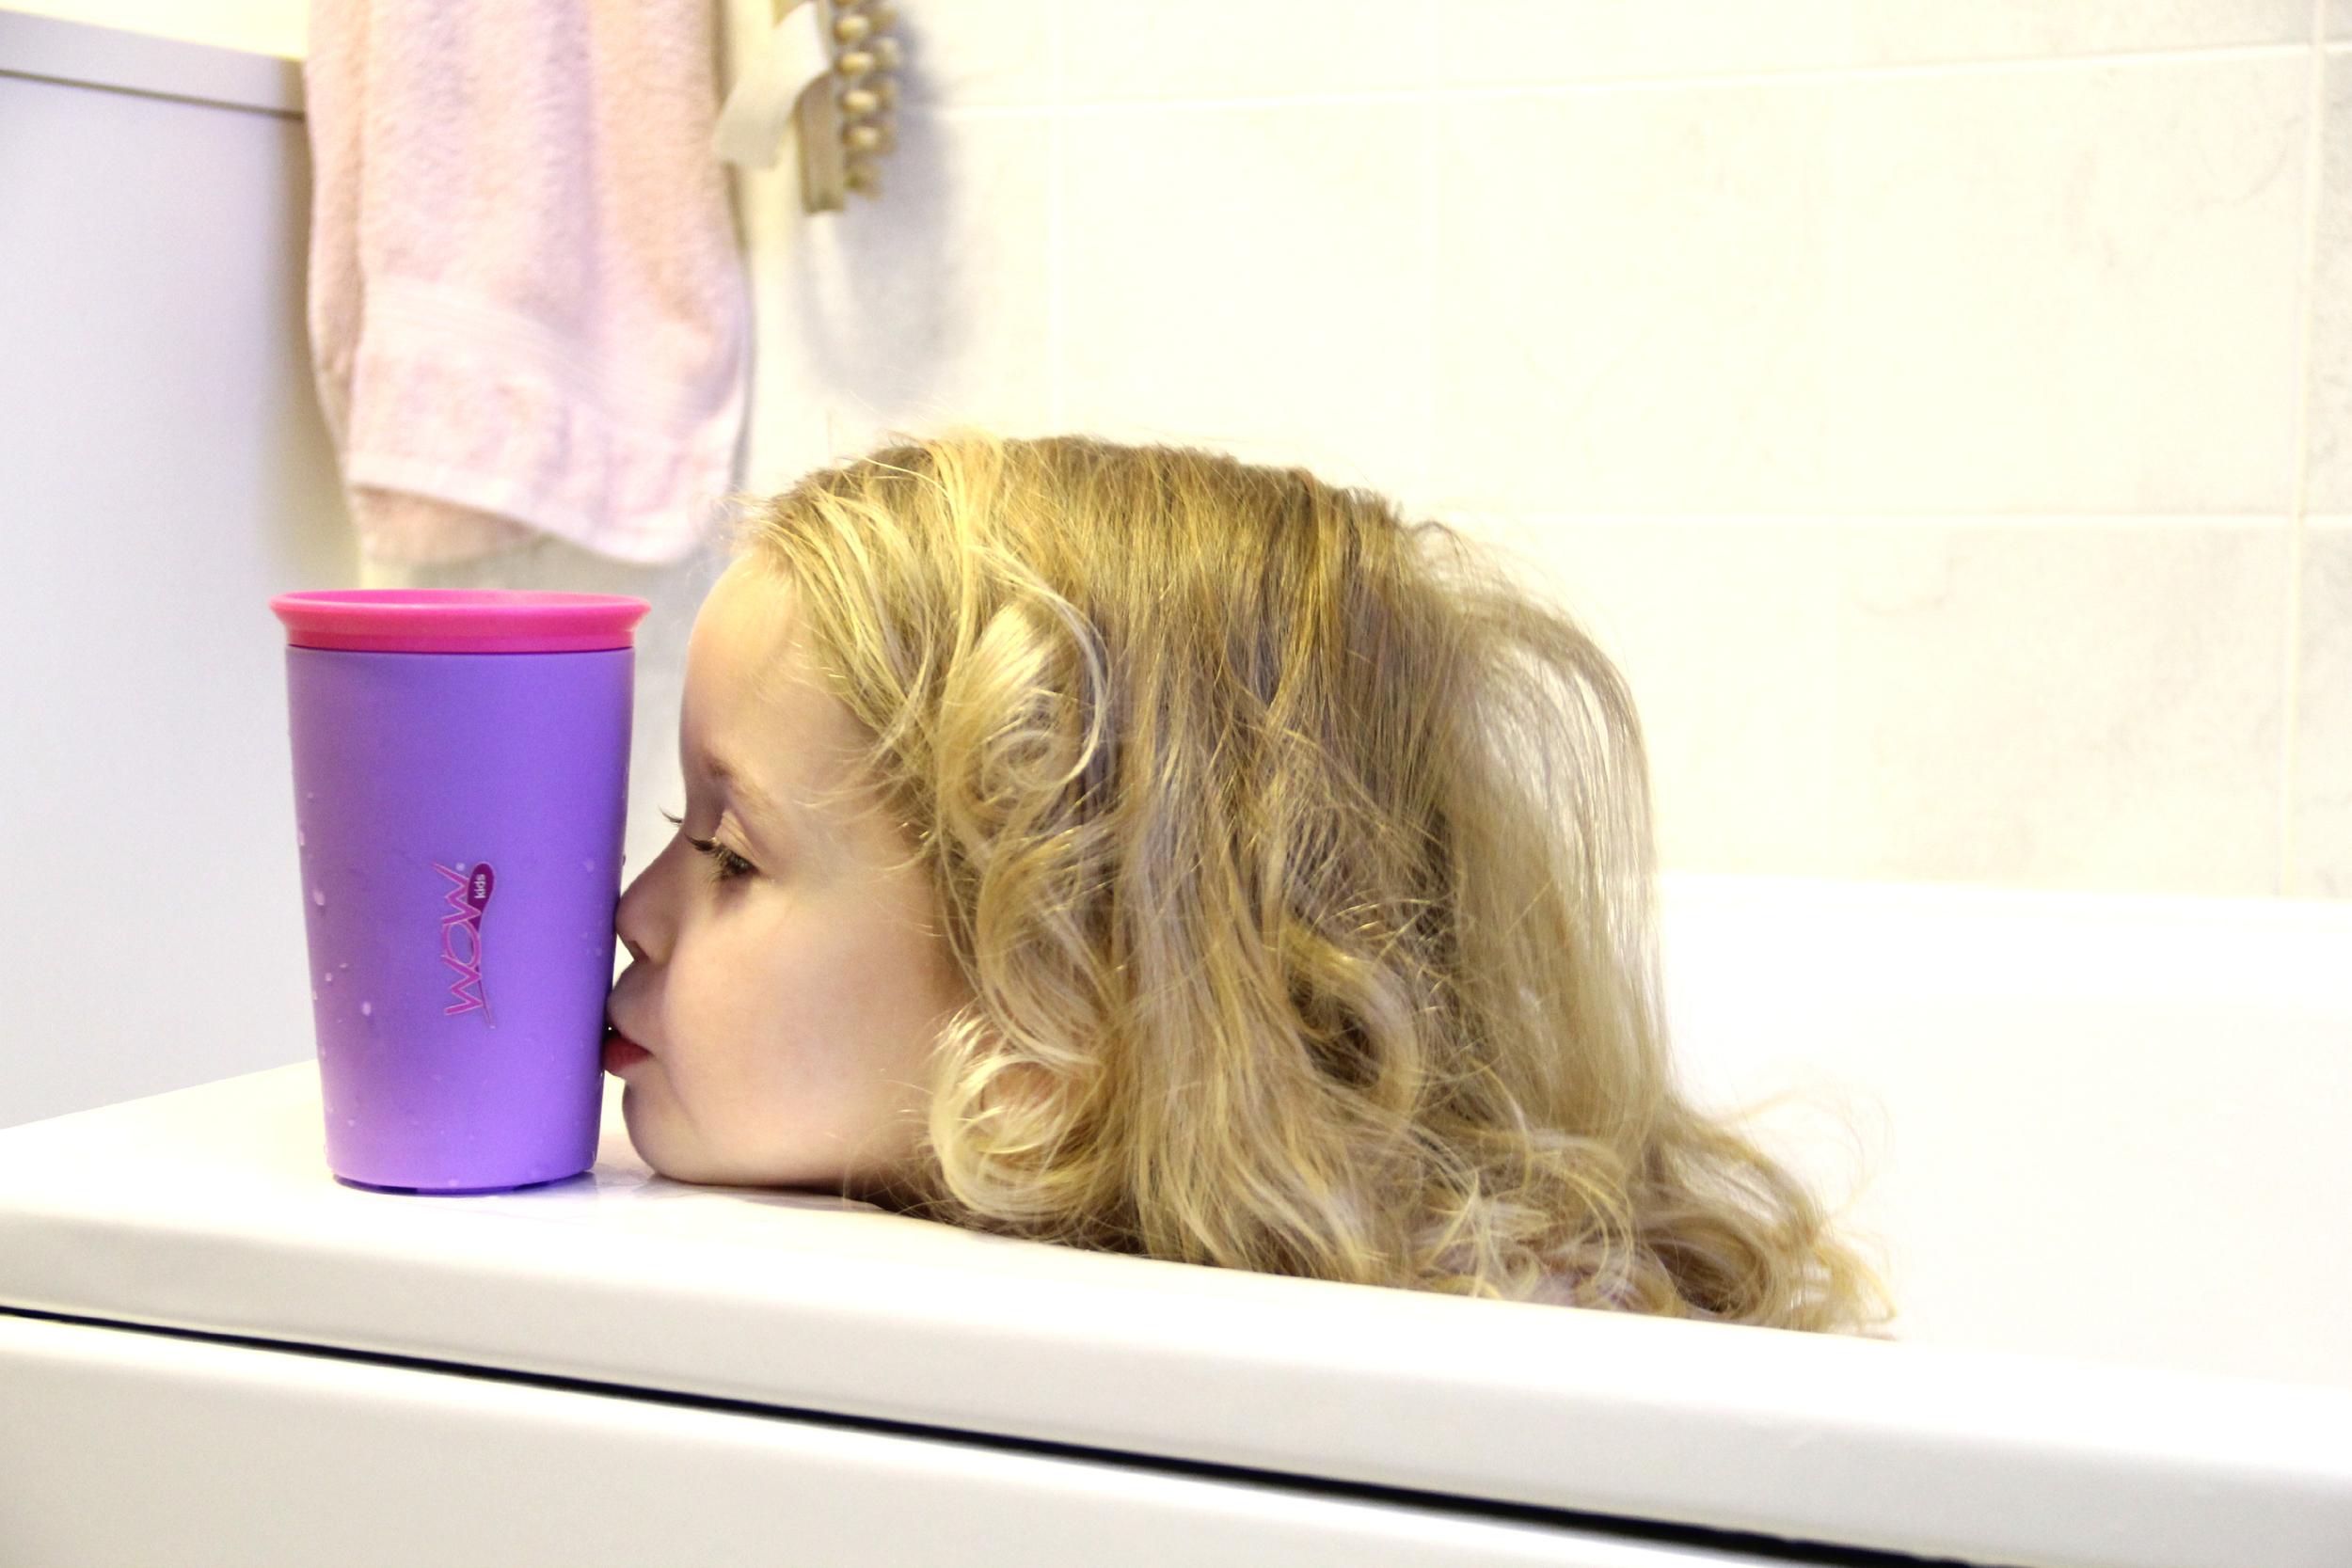 Victoria elsker koppen sin